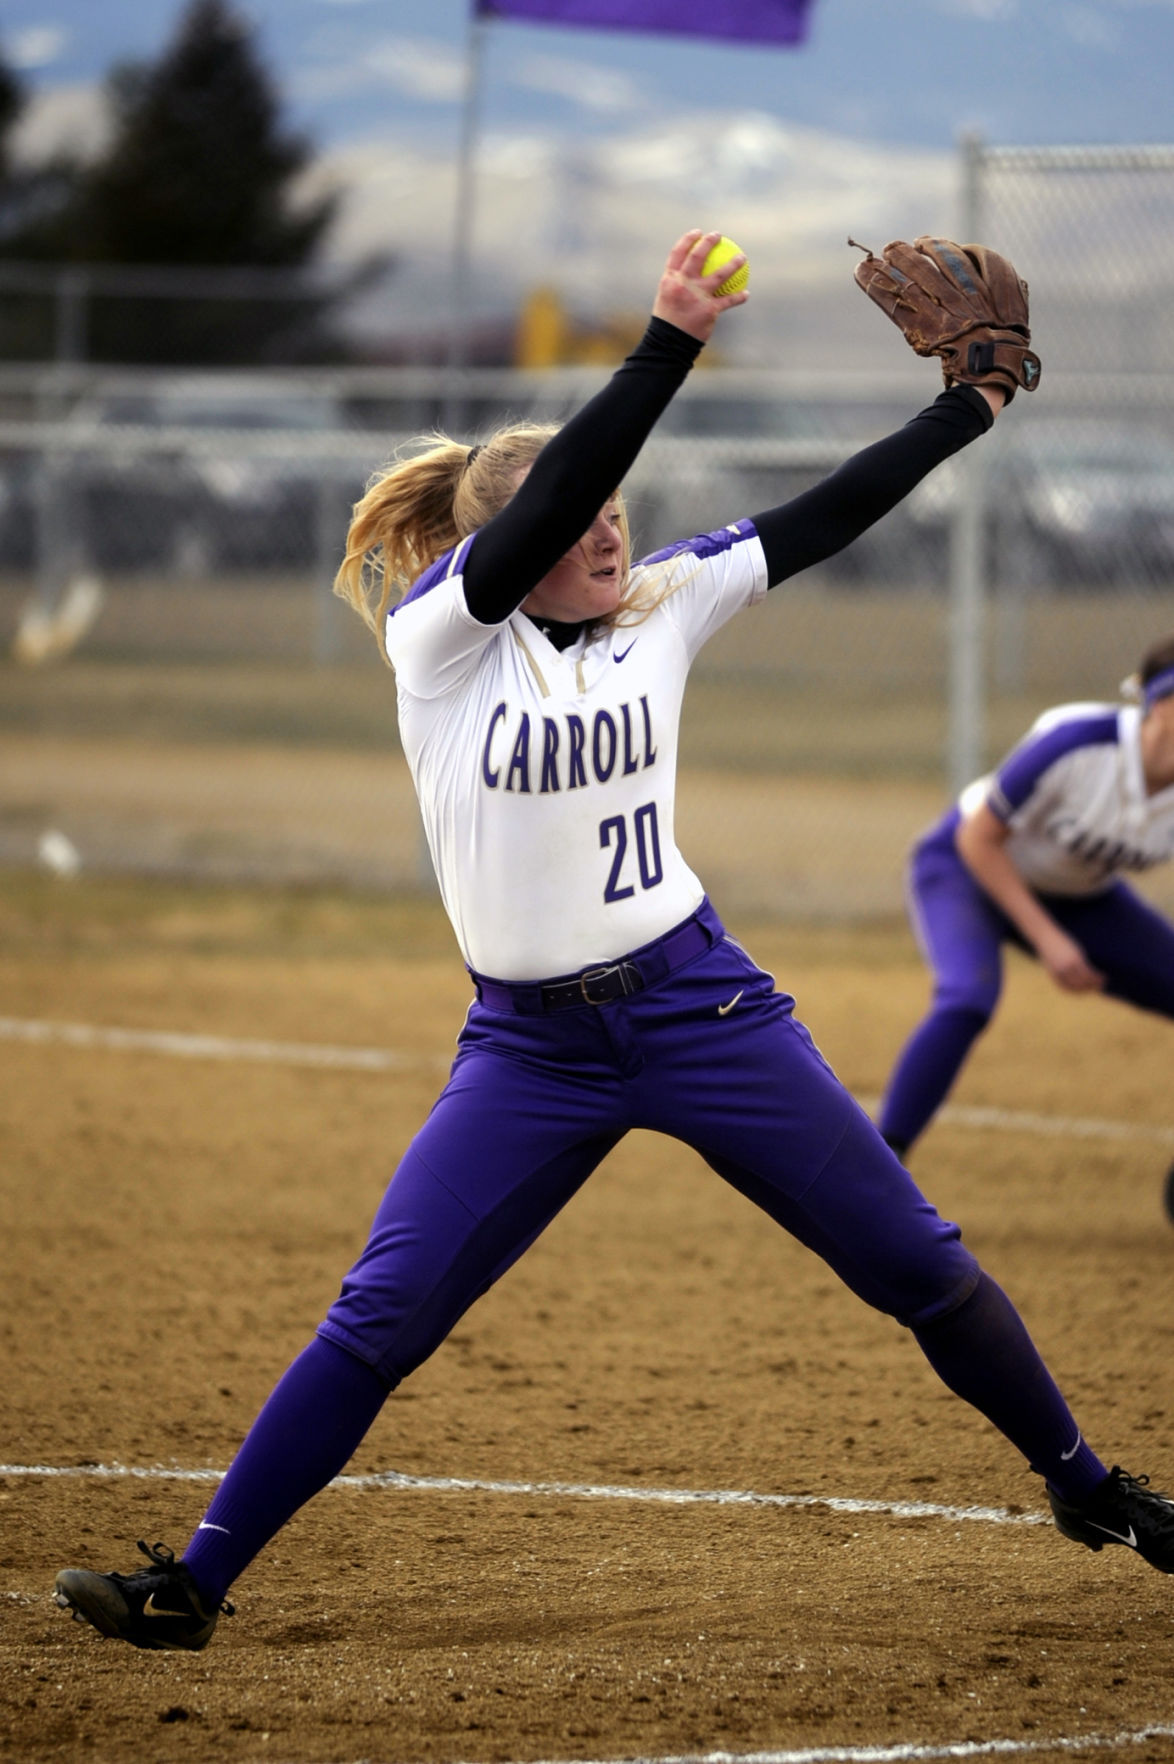 carroll softball